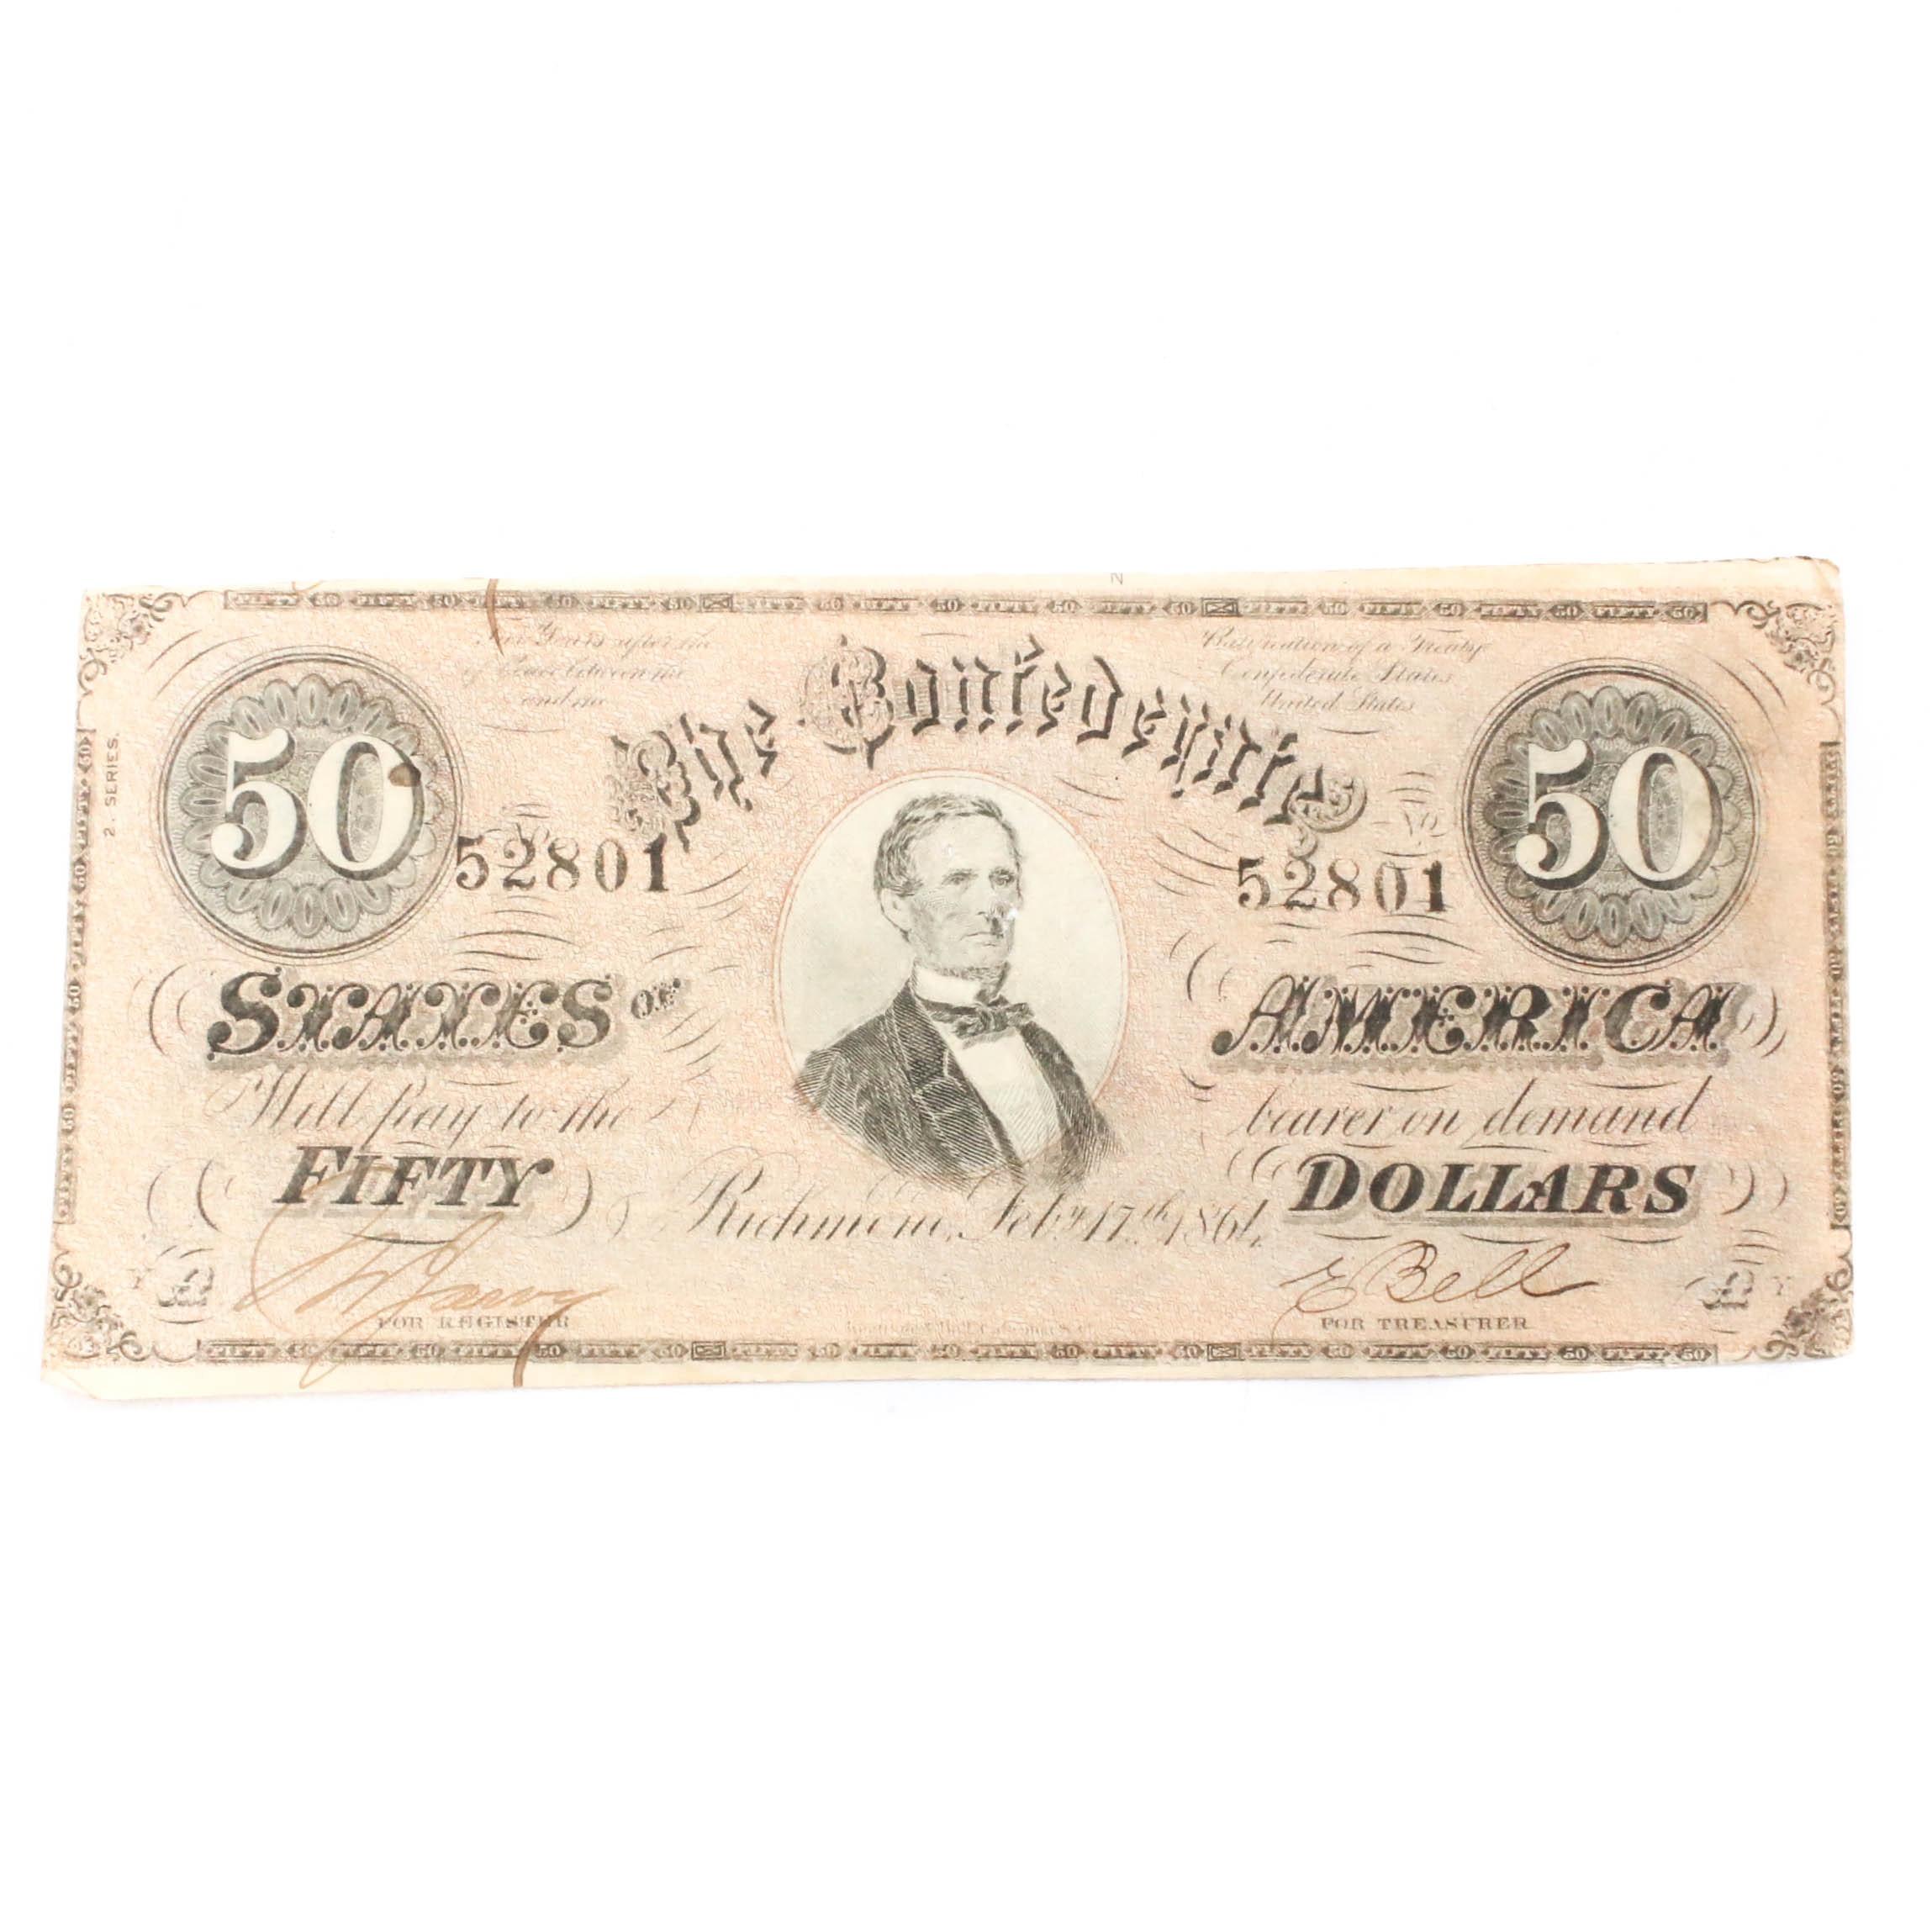 1864 Confederate States of America $50 Banknote